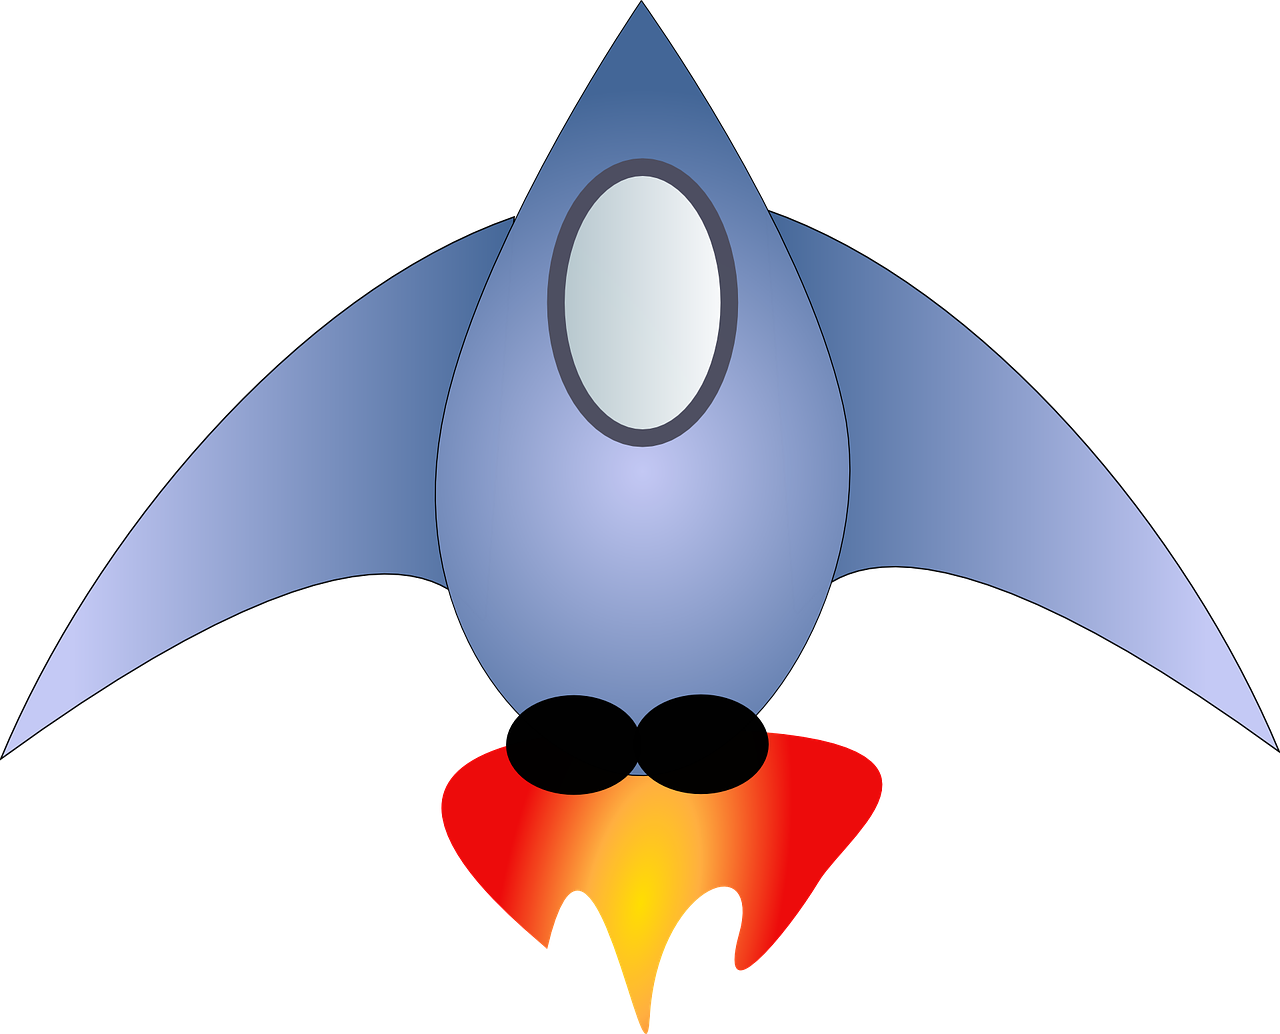 Rocketship clipart space craft. Rocket spaceship take off